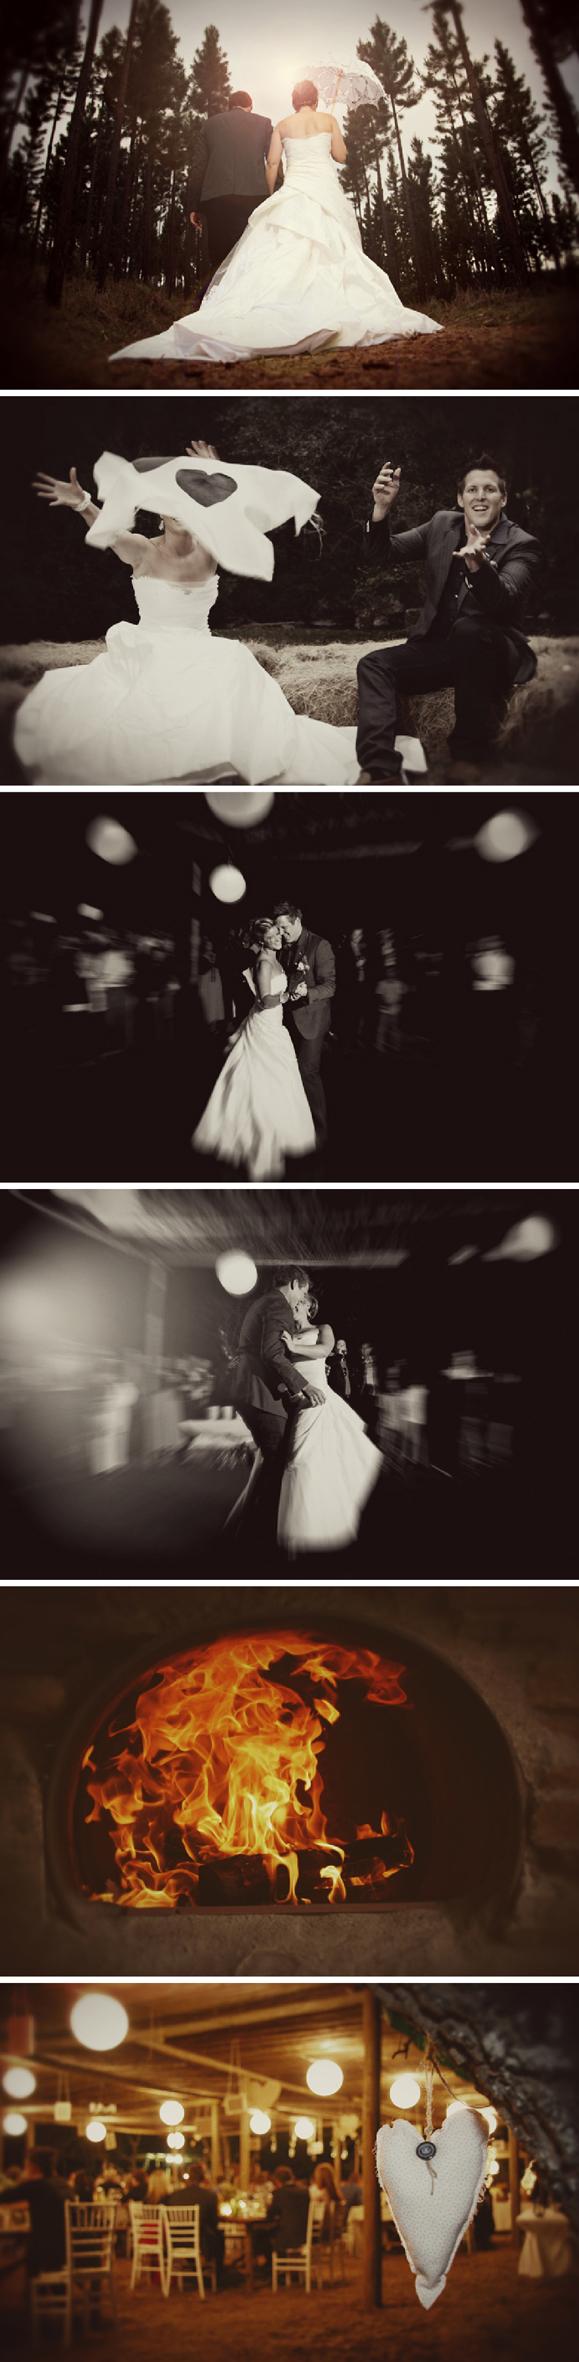 OUR_WEDDING_04.jpg